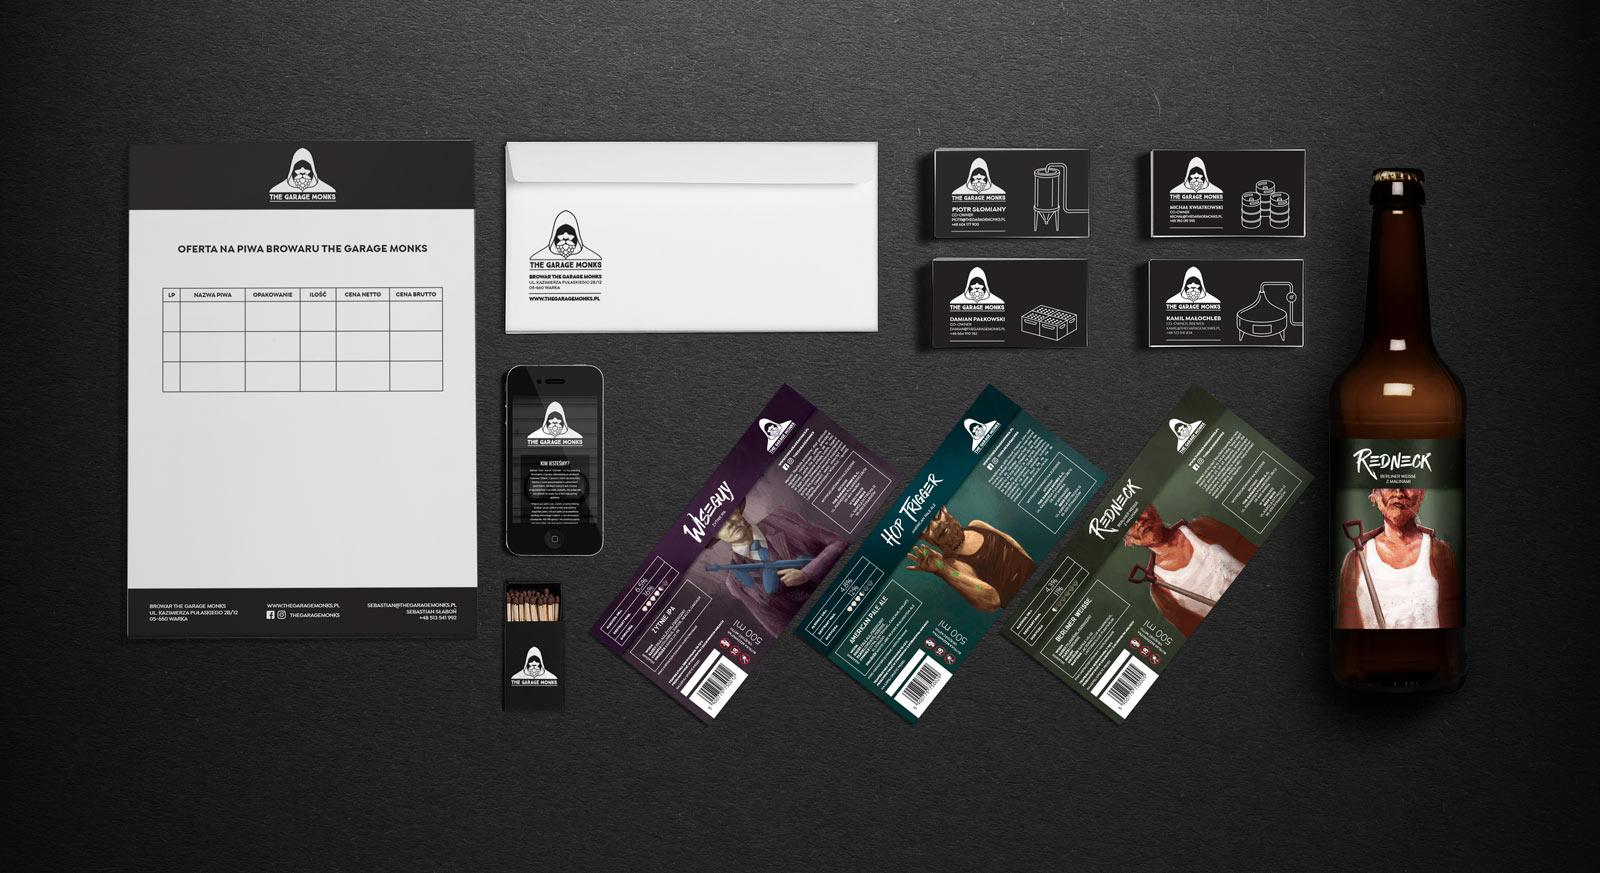 The Garage Monks visual identity branding by Jakub Cichecki